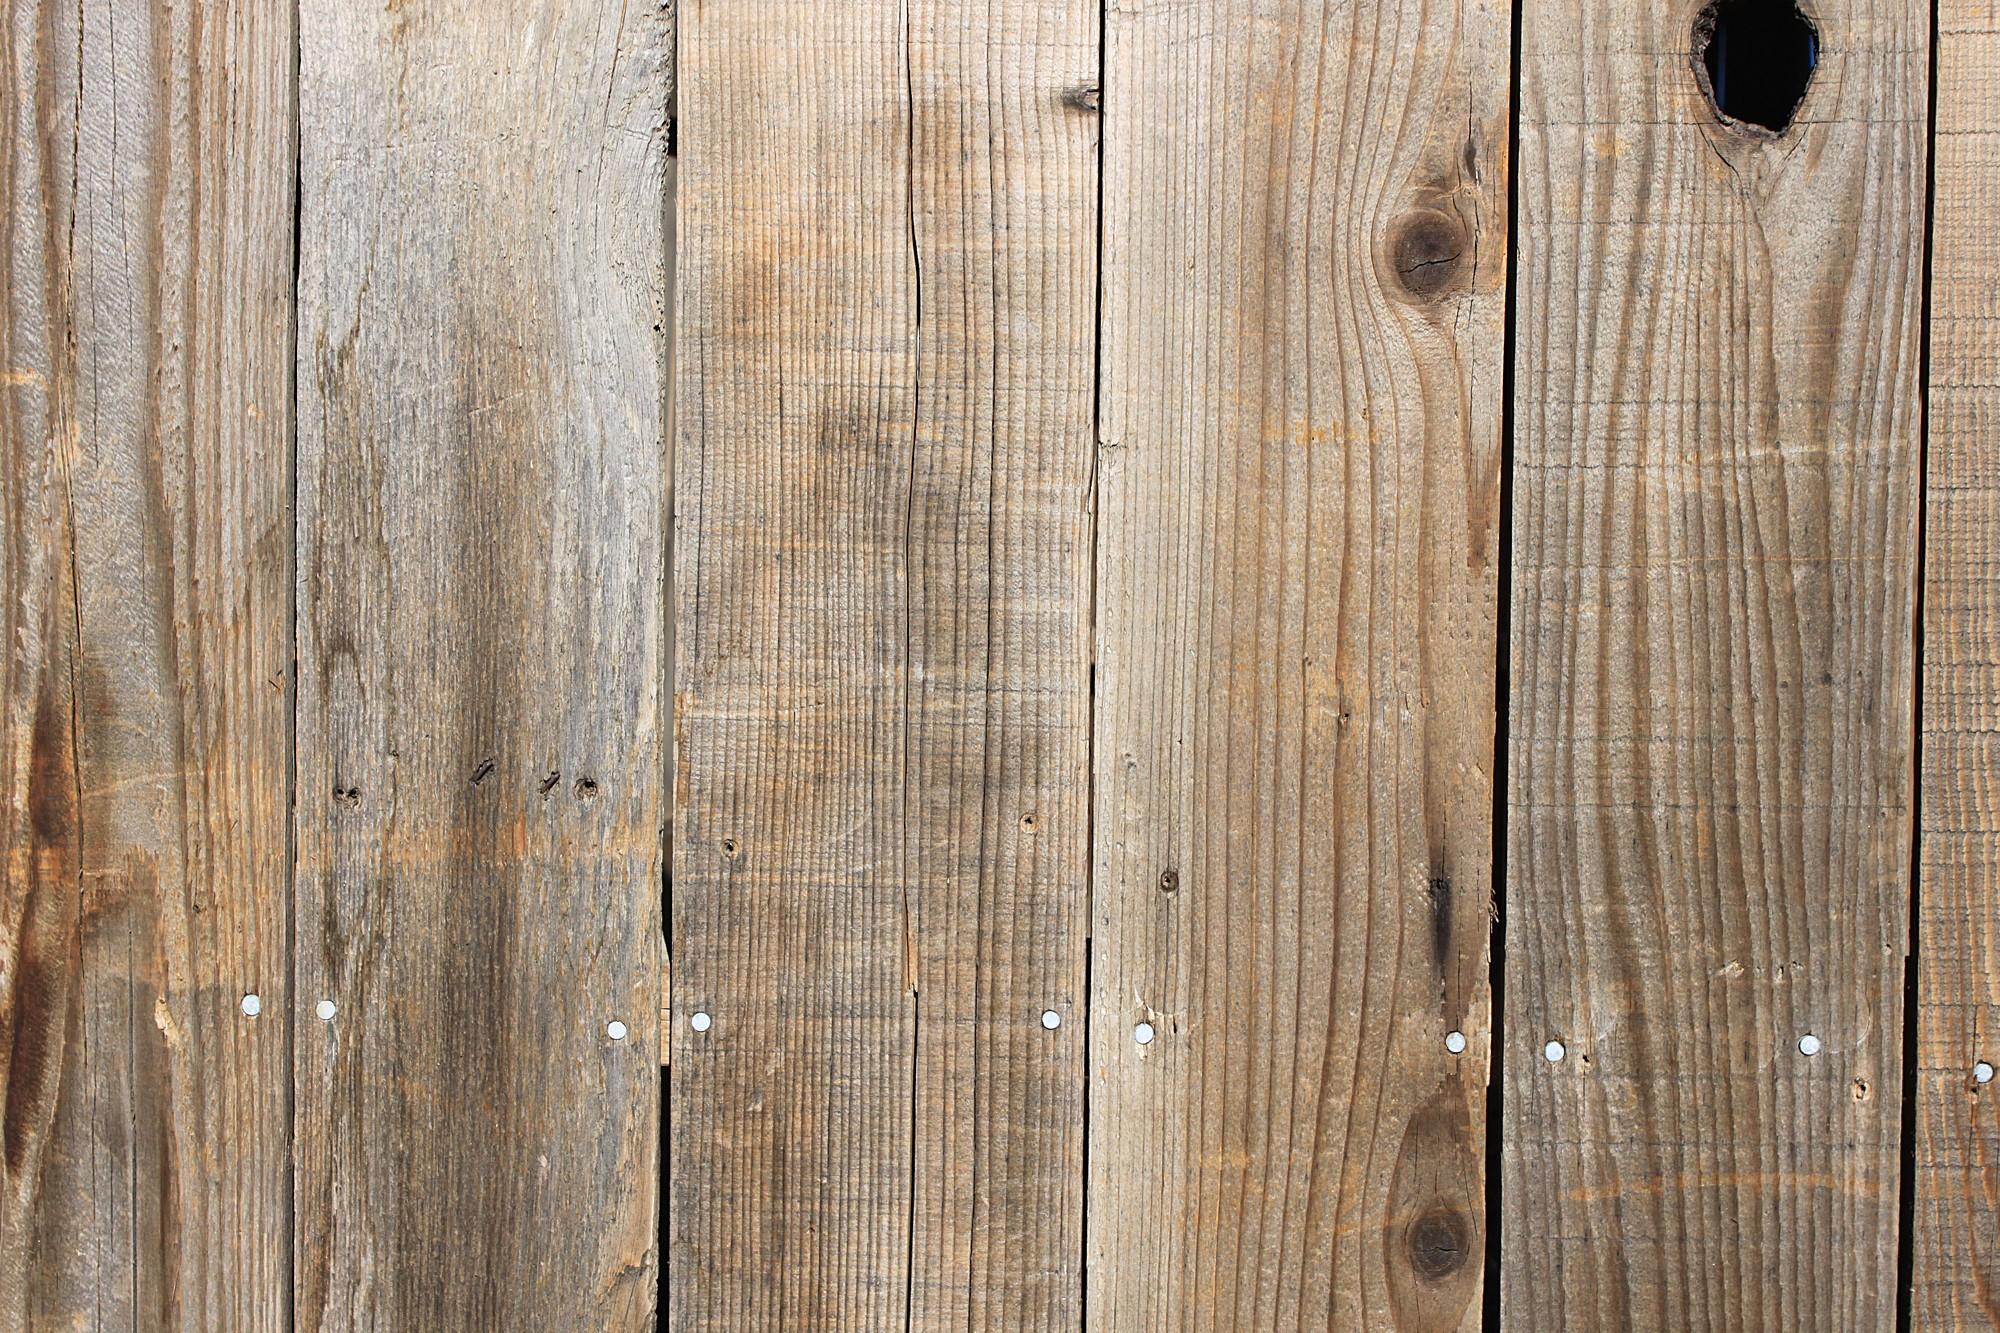 Rustic barn wood background ·① download free beautiful